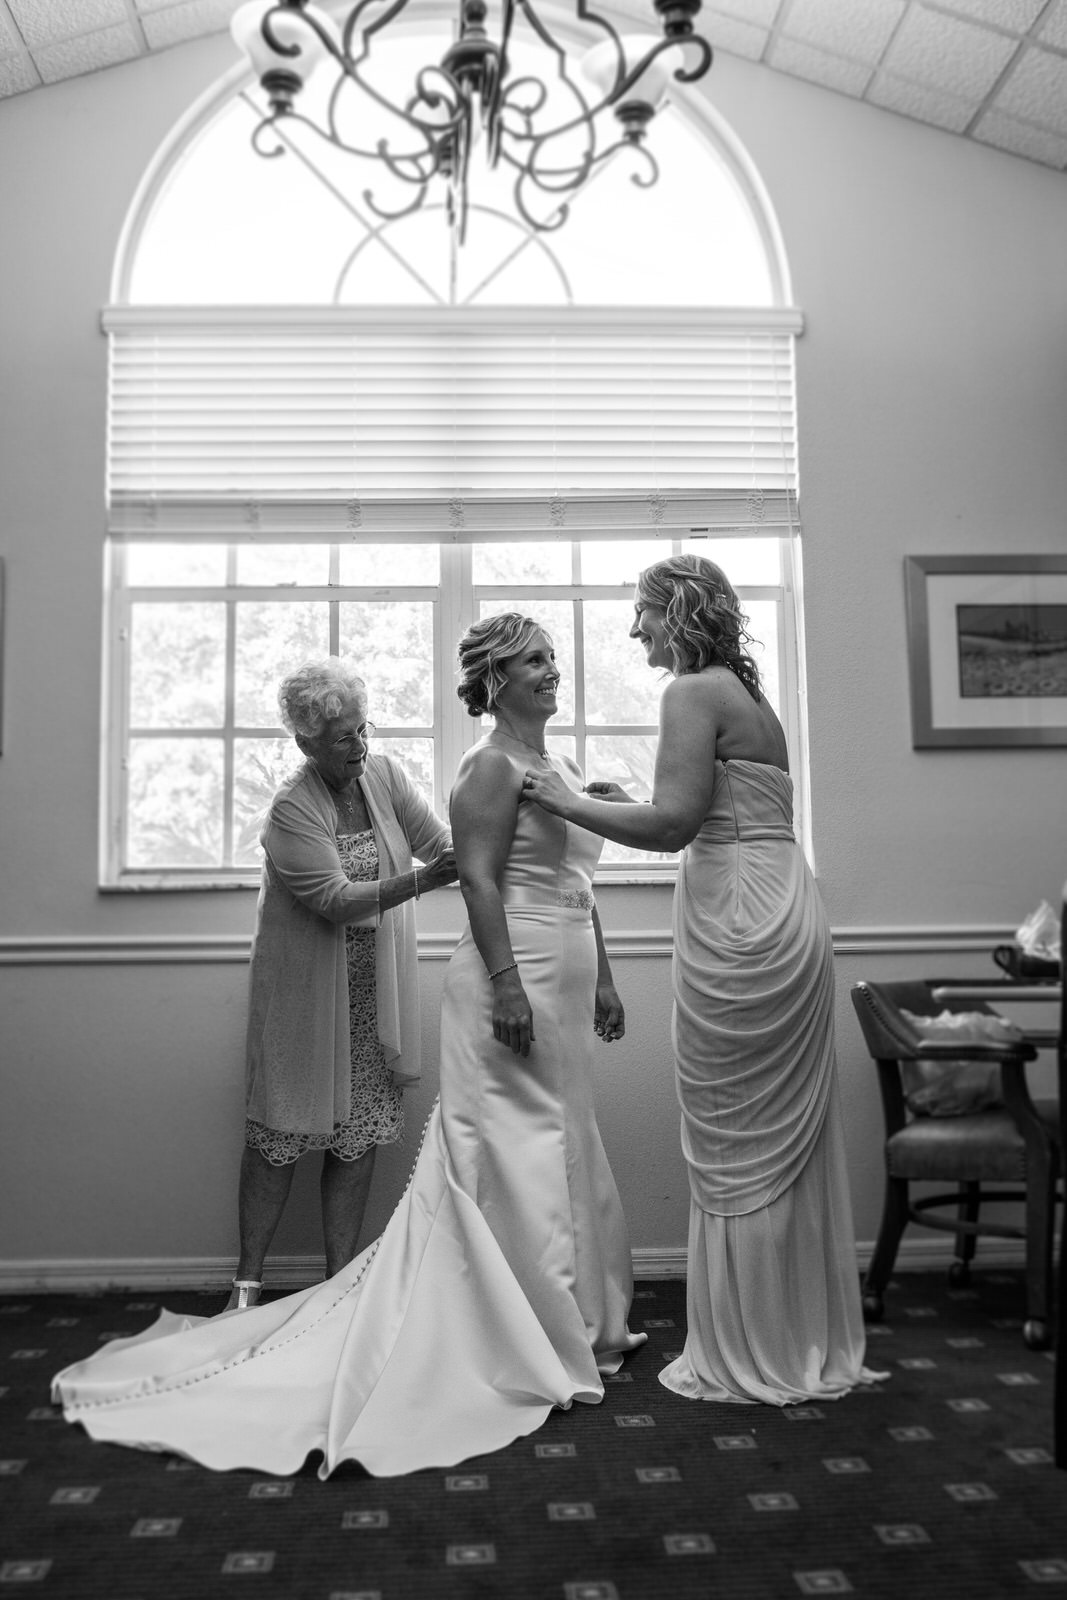 Mike_&_Barbaras_Wedding_3_24_2018-65.jpg